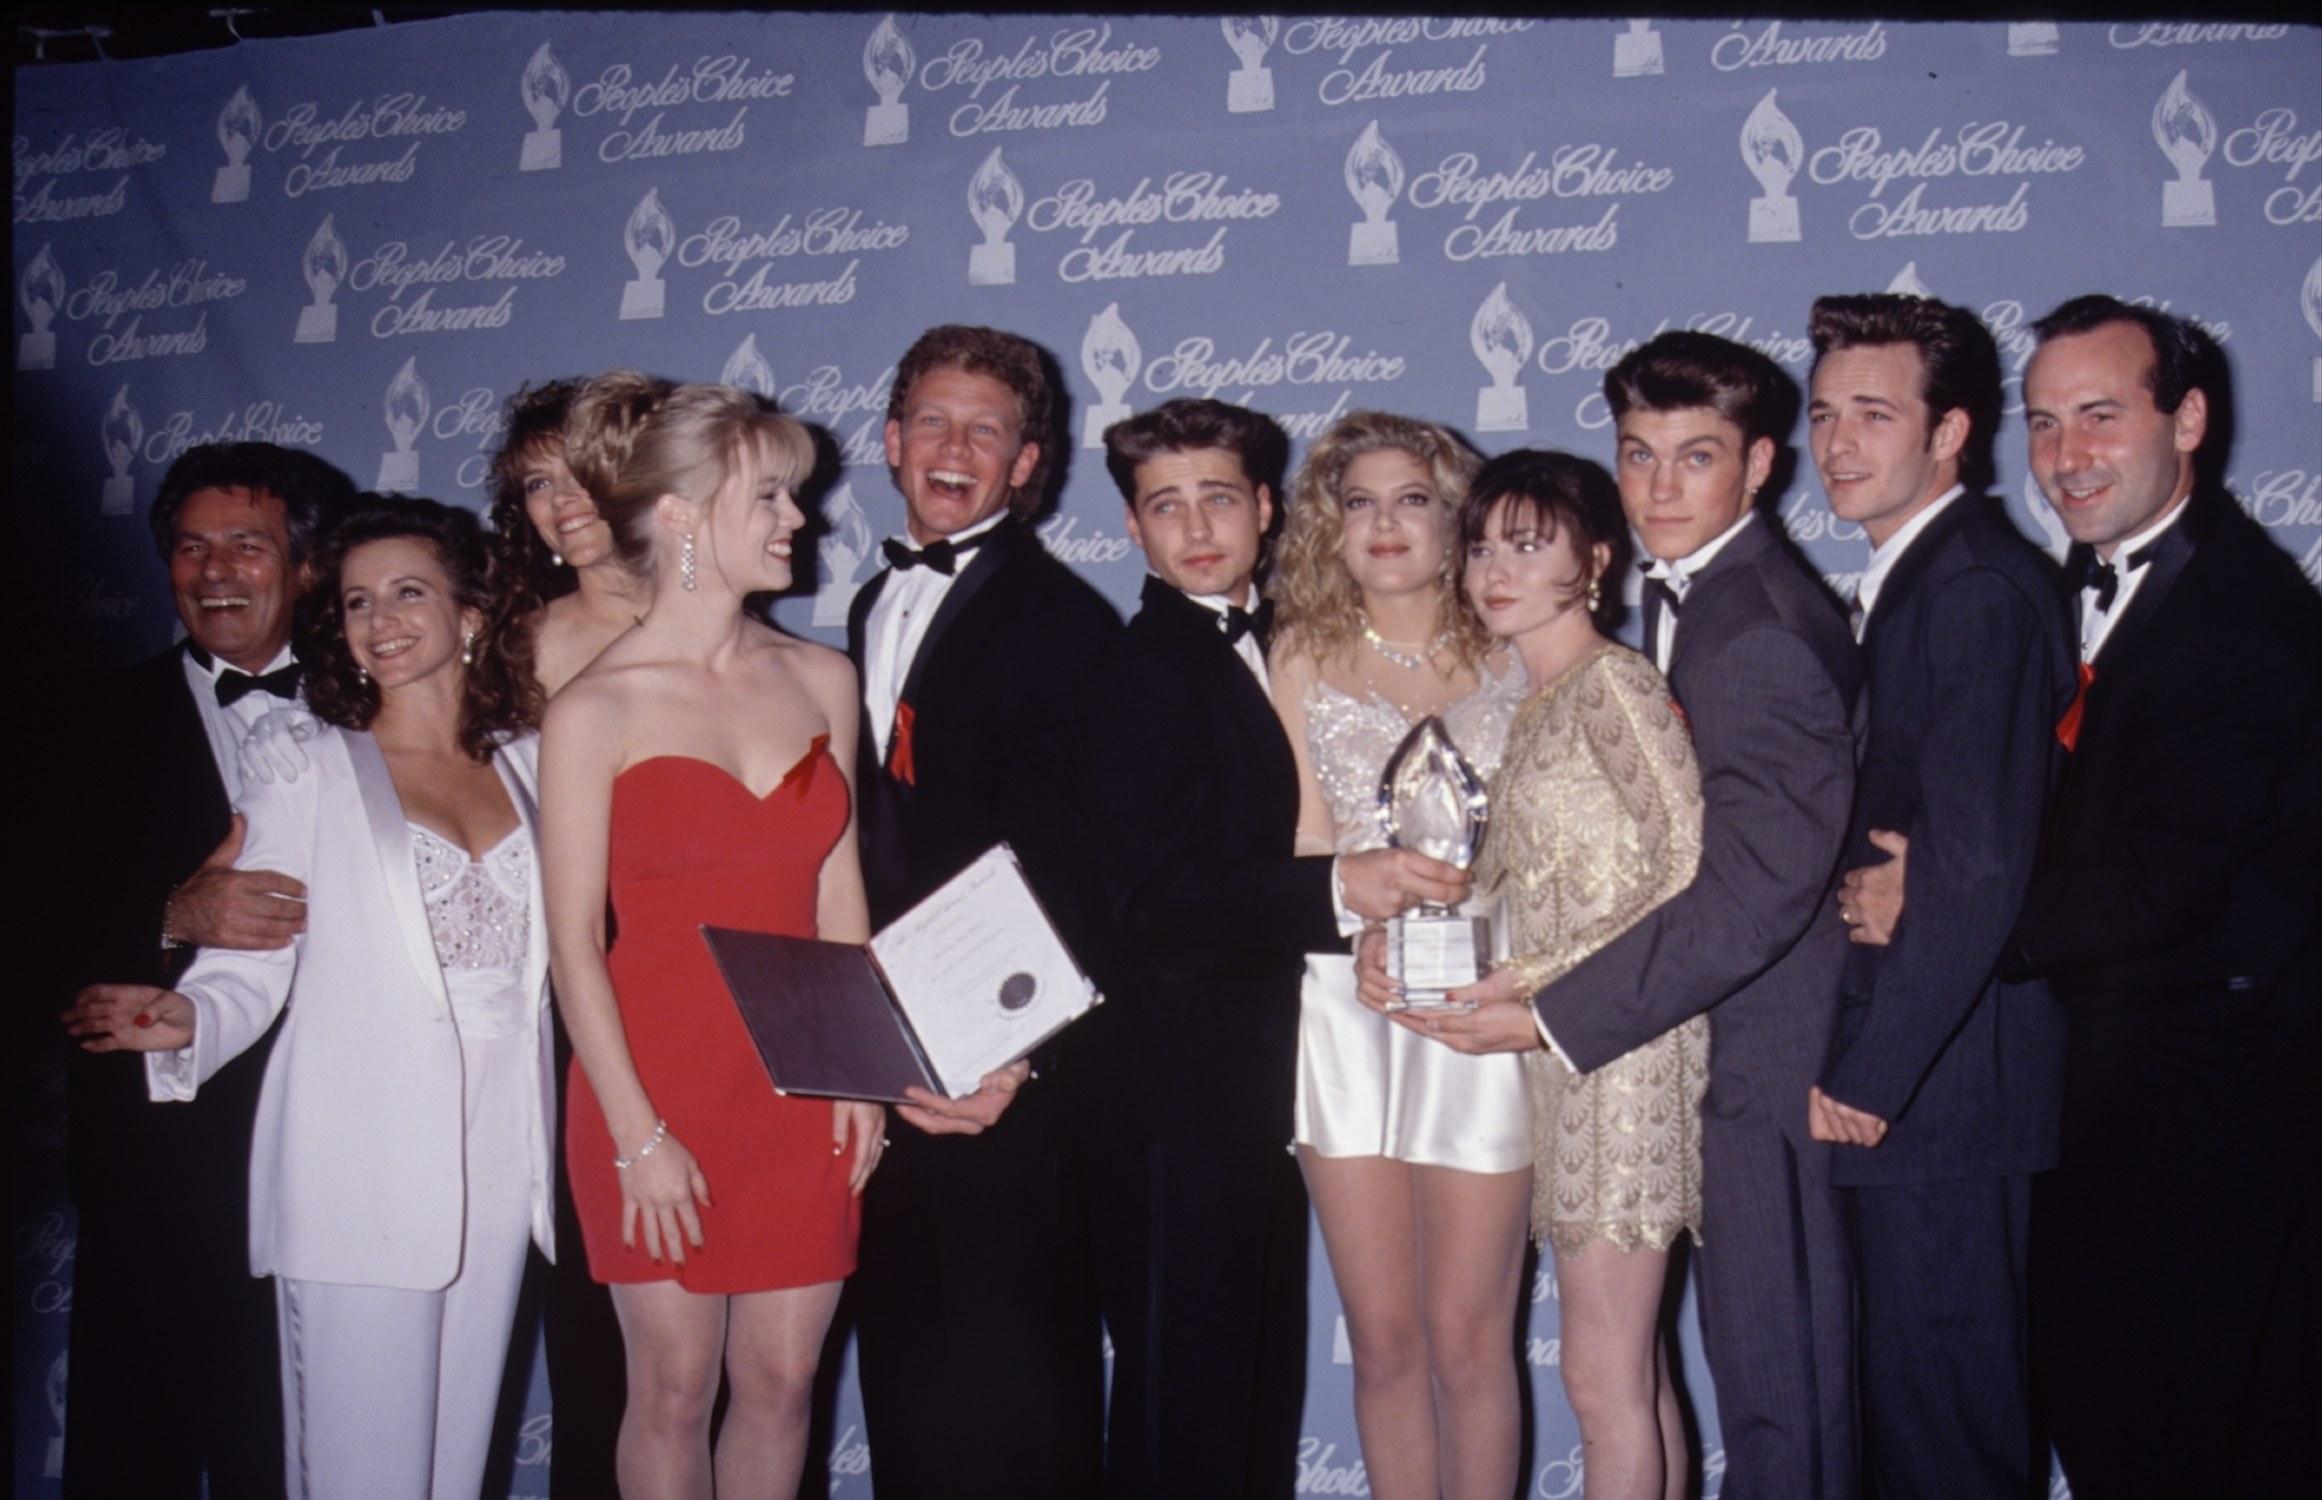 Attori Beverly Hills, 90210 - Neomag.